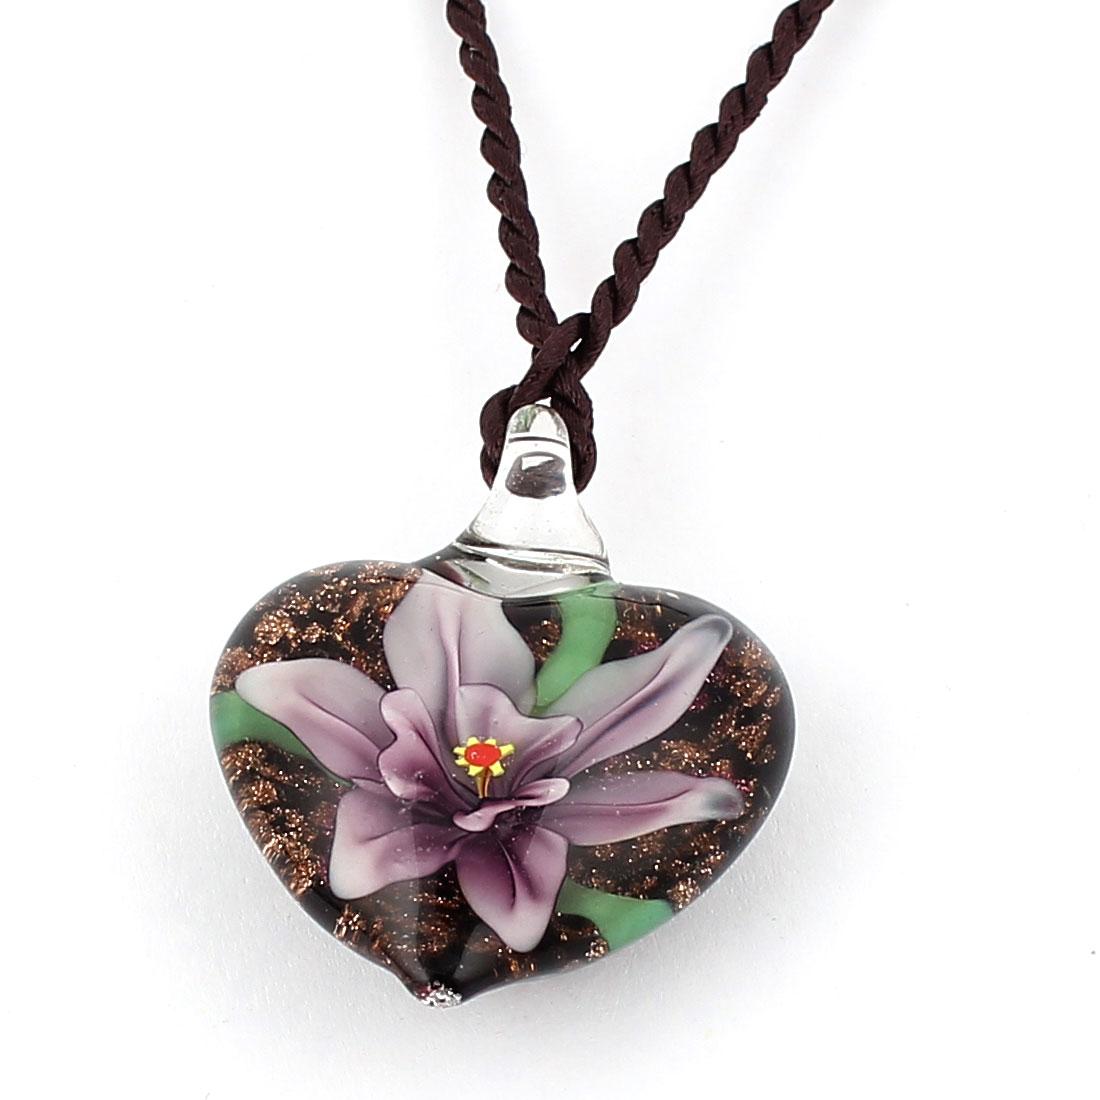 Nylon String Heart Style Glass Pressed Flower Pendant Necklace Purple Black